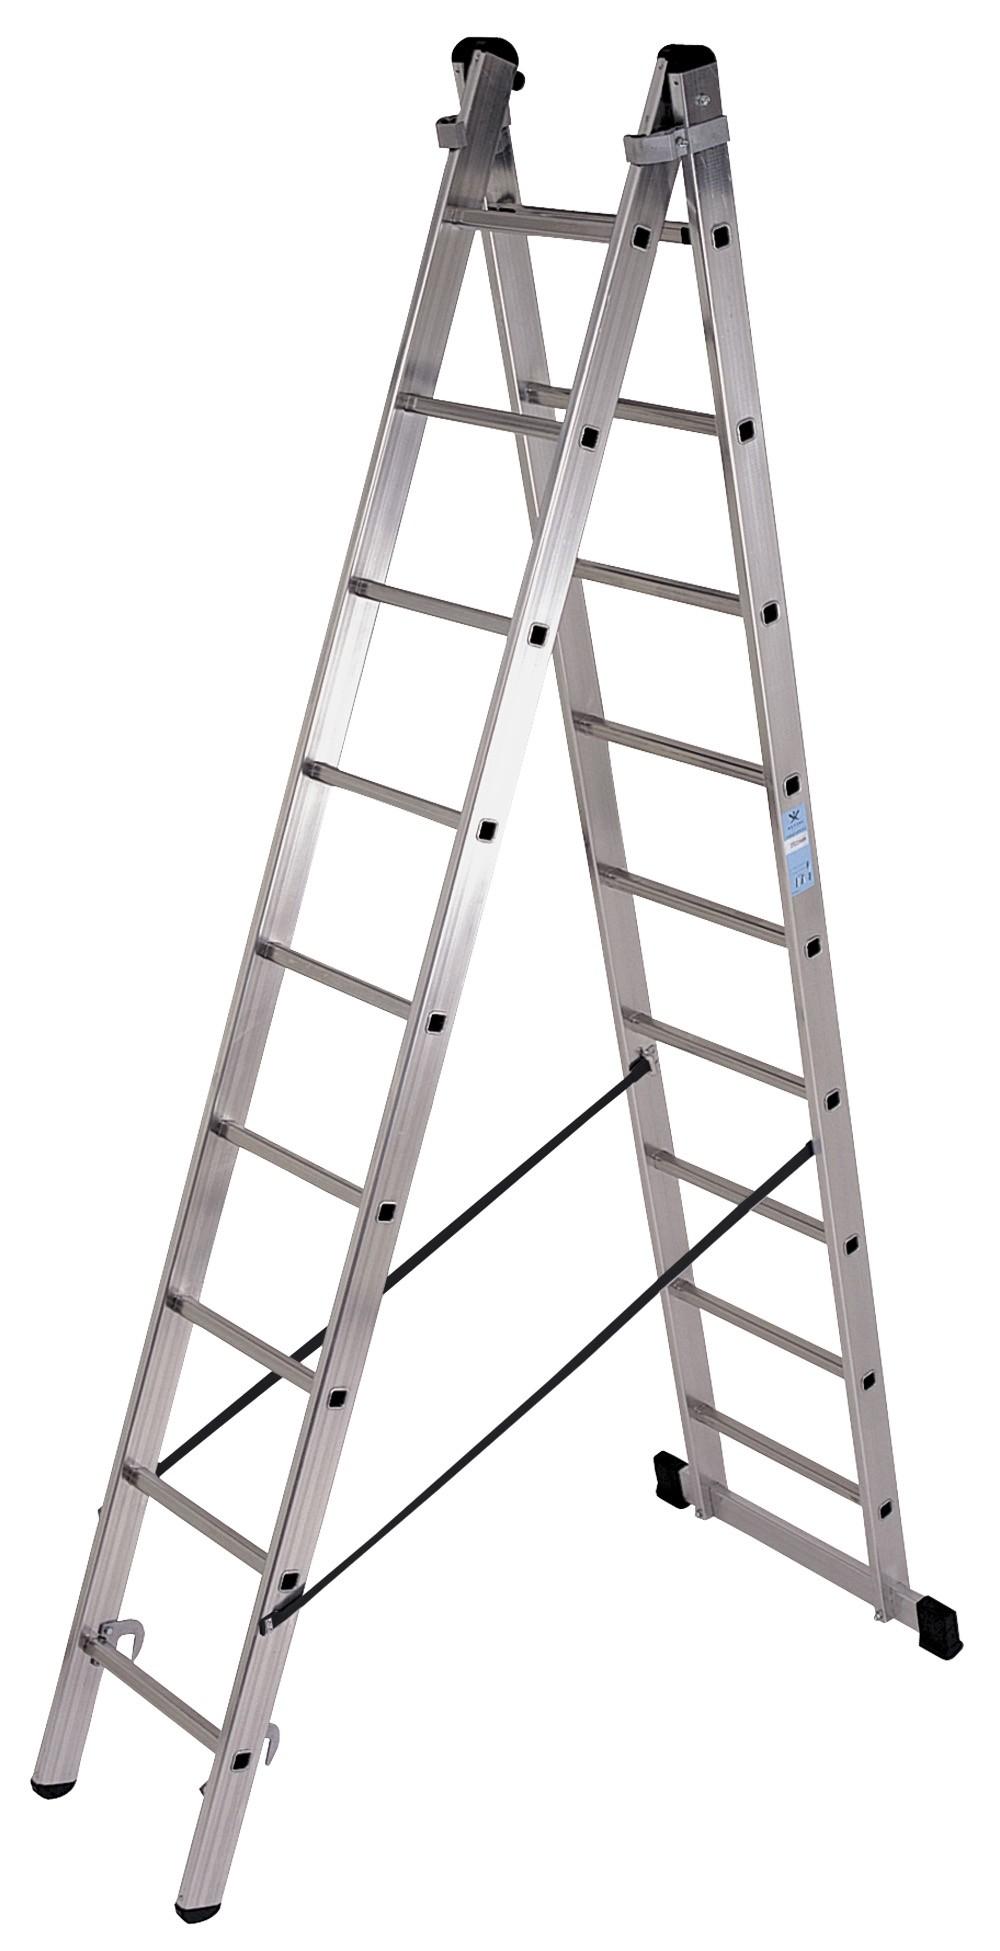 Escalera Plegable del Hogar 3 Niveles en Ambos Lados Capacidad 150 Kg Aluminio GLT23K SONGMICS Escalera de Tijera Escalera de Mano